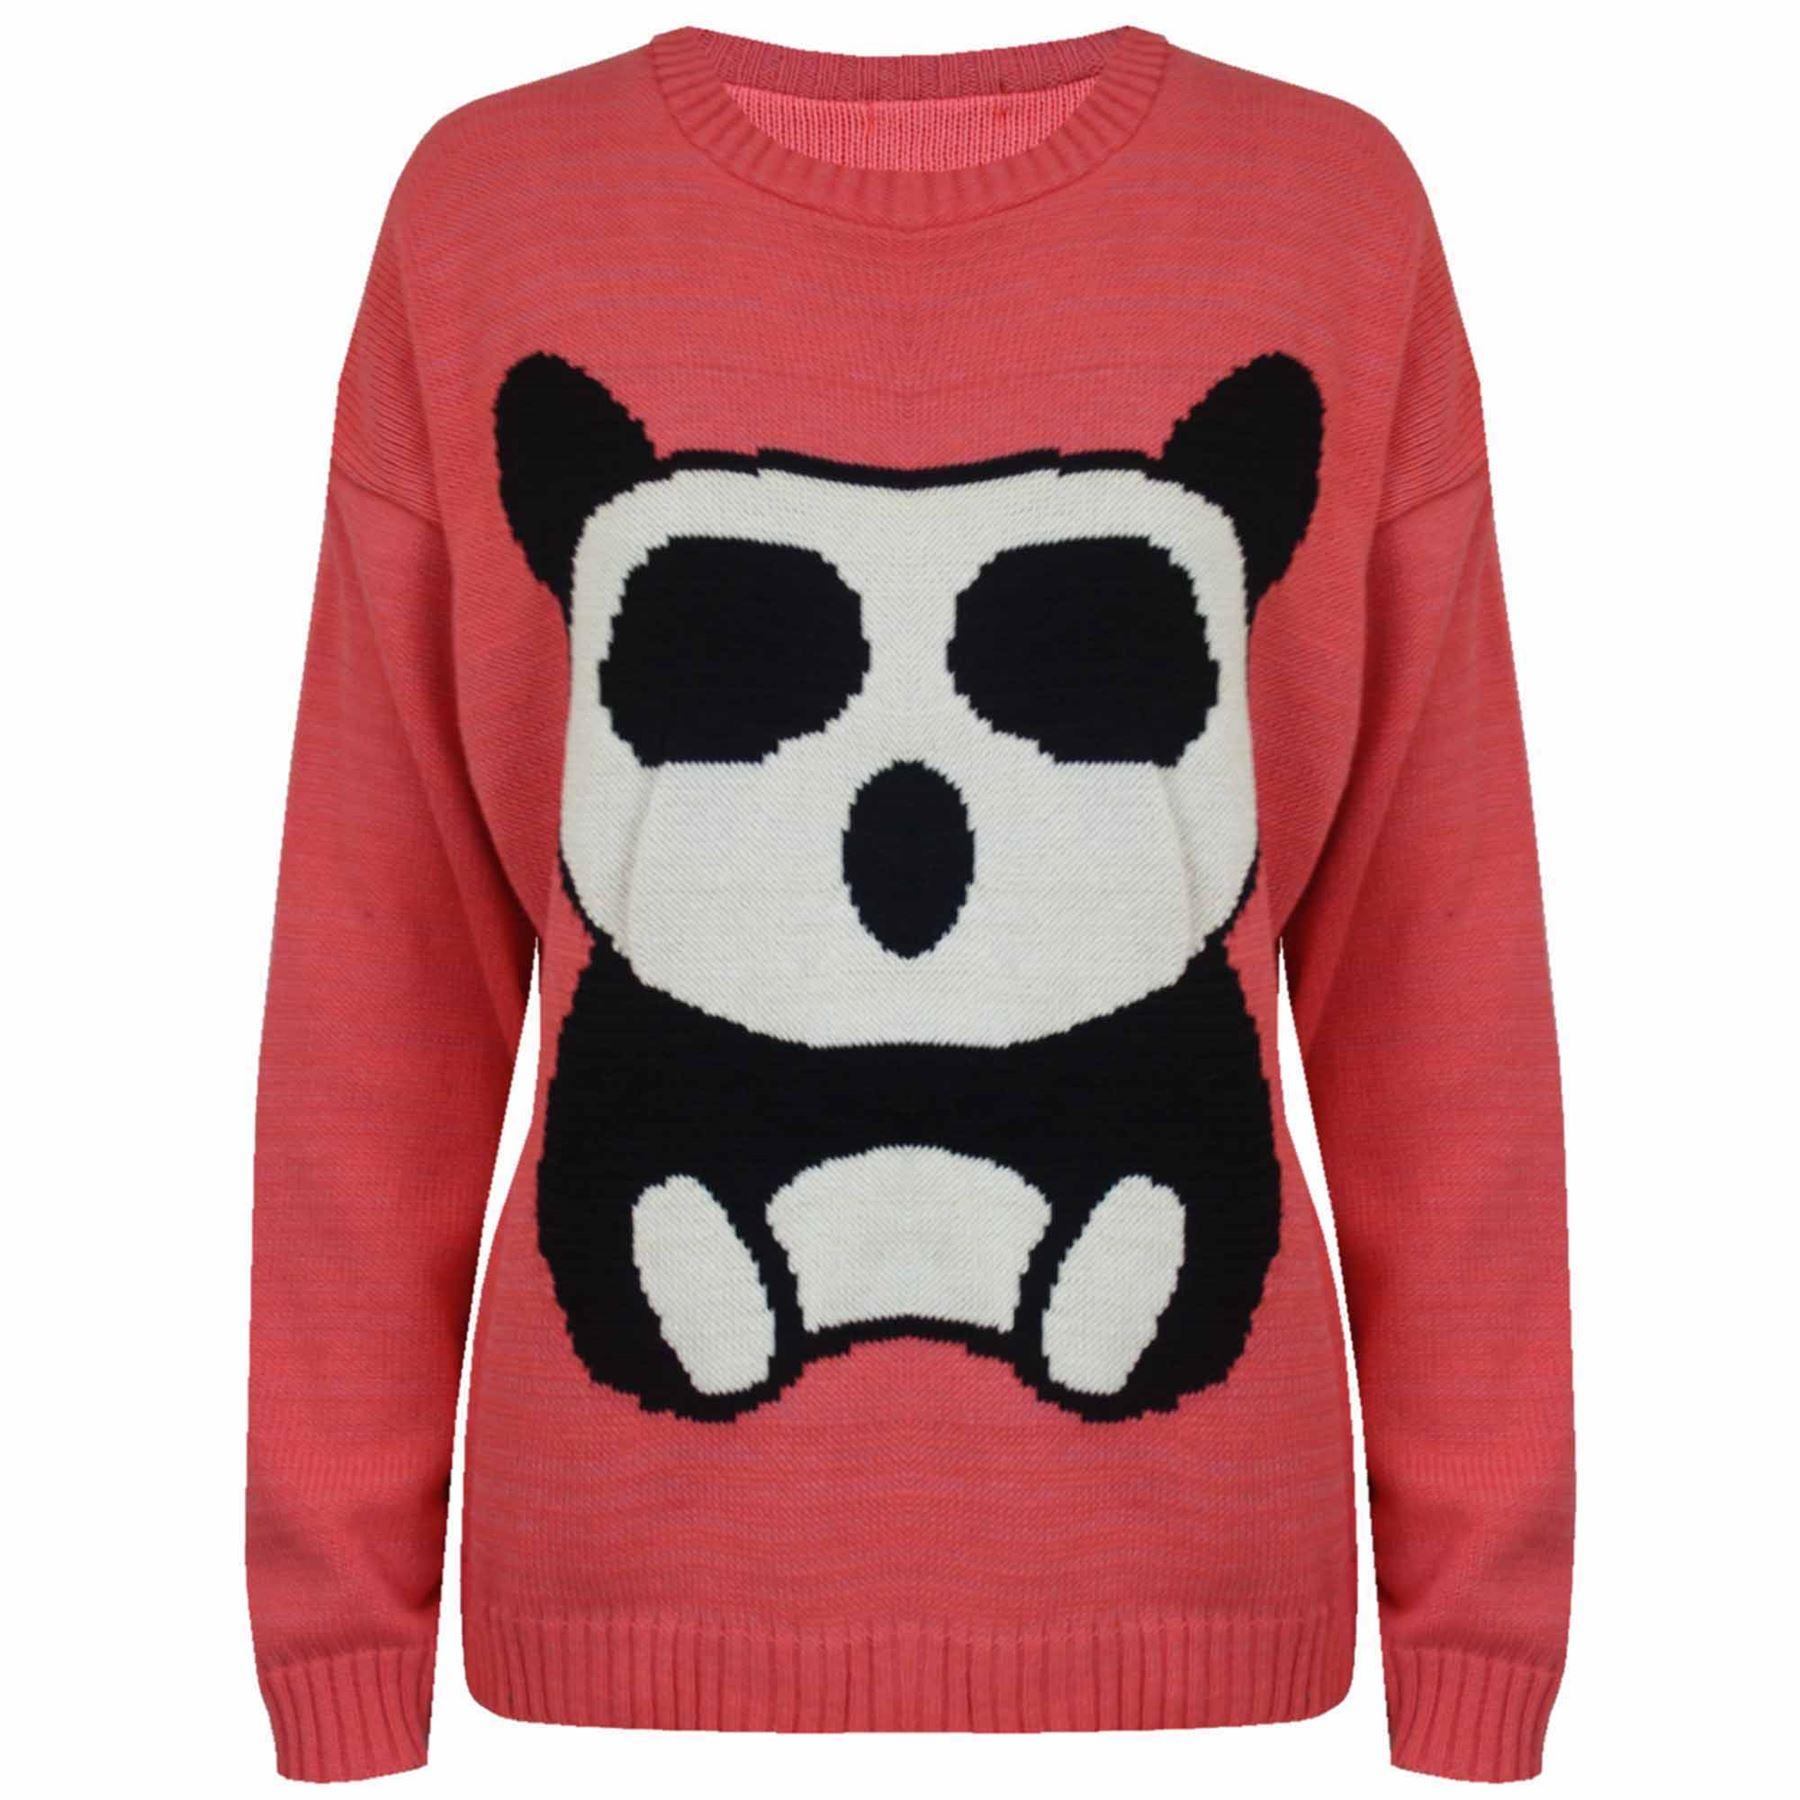 Knitting Pattern Panda Jumper : Ladies Panda Print Knitted Girls Long Sleeves Womens Pullover Sweater Jumper ...